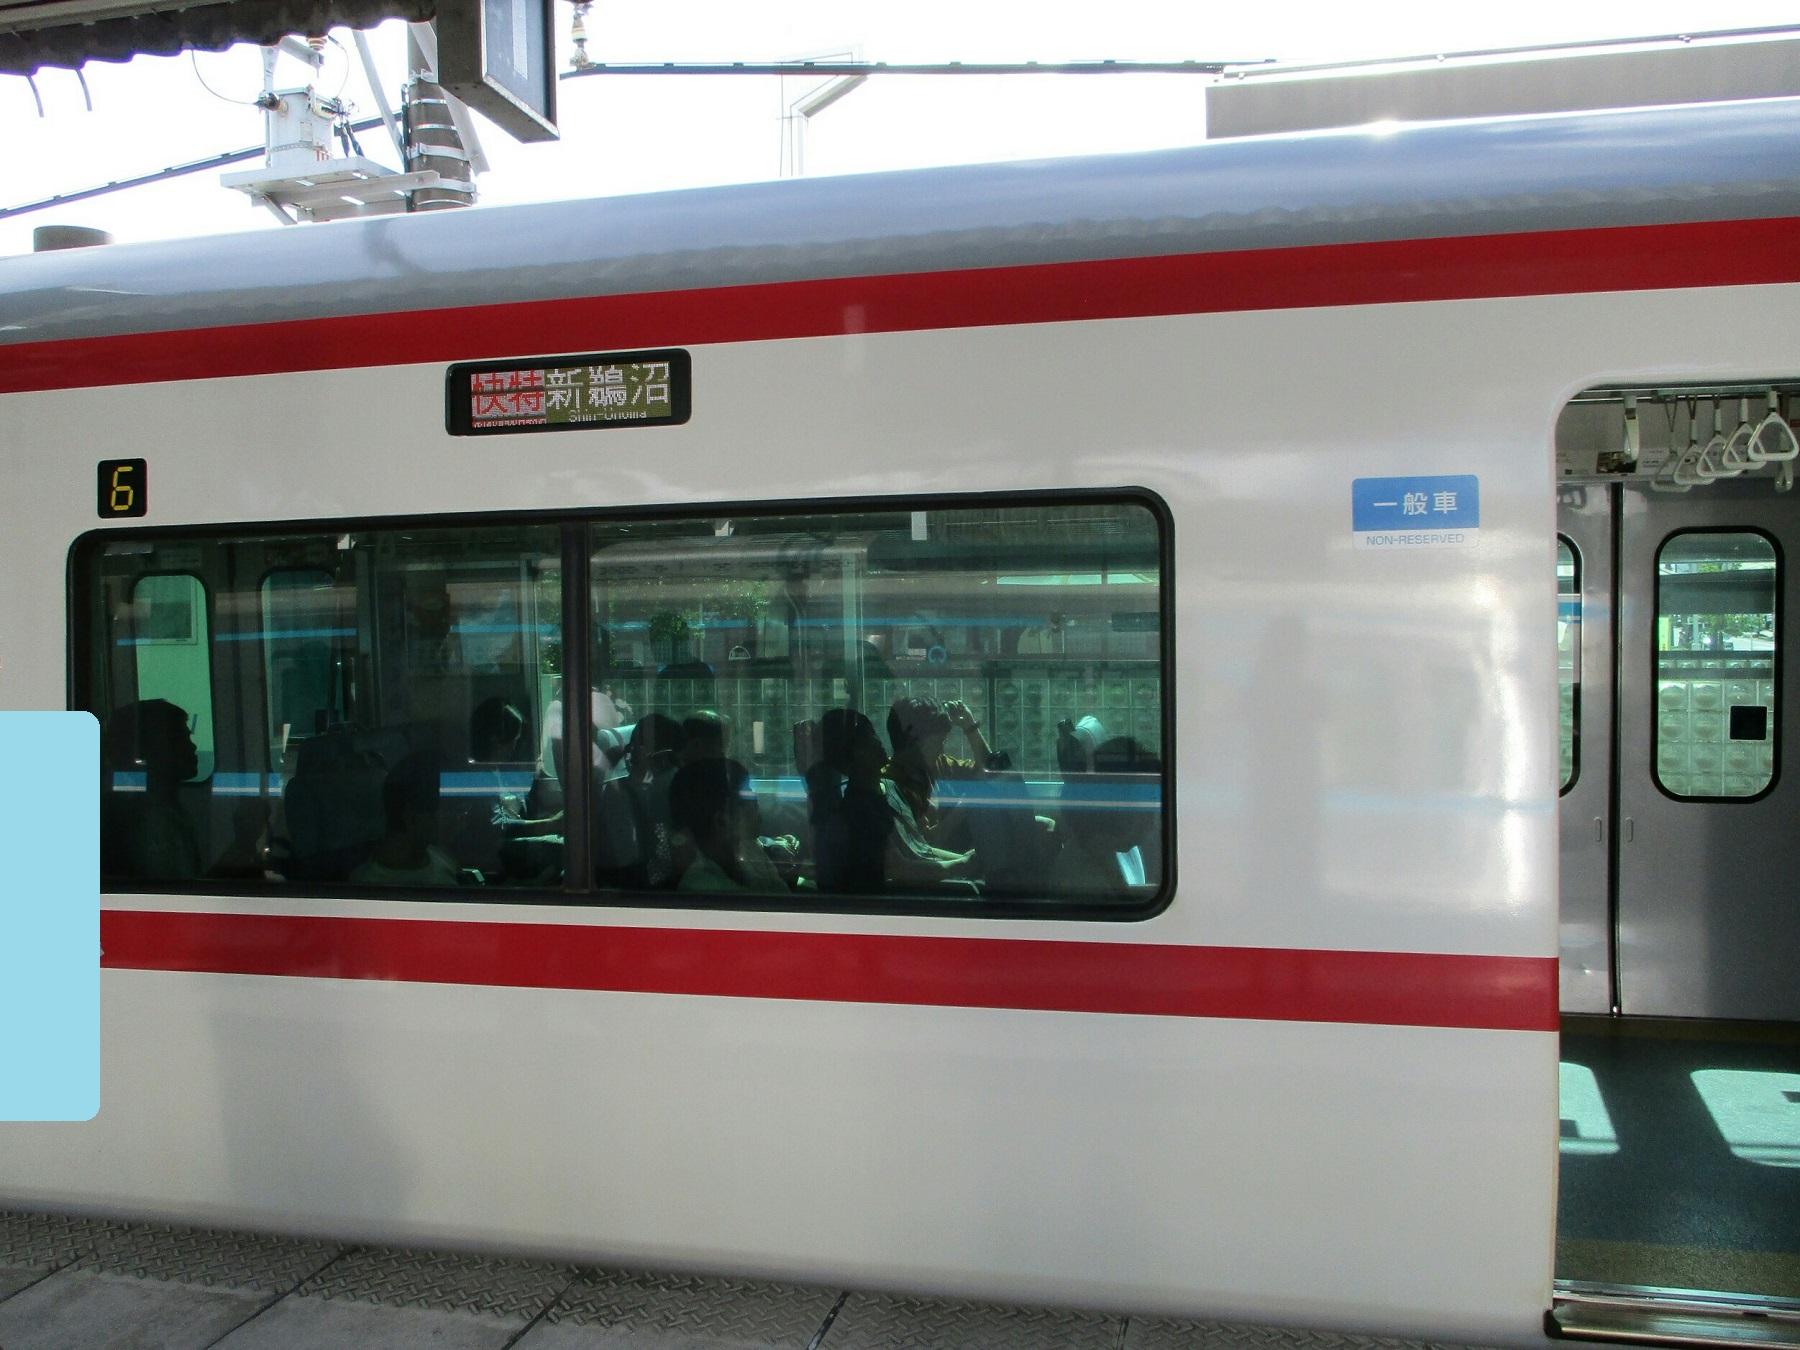 2018.6.30 (8) 岩倉 - 新鵜沼いき快速特急 1800-1350